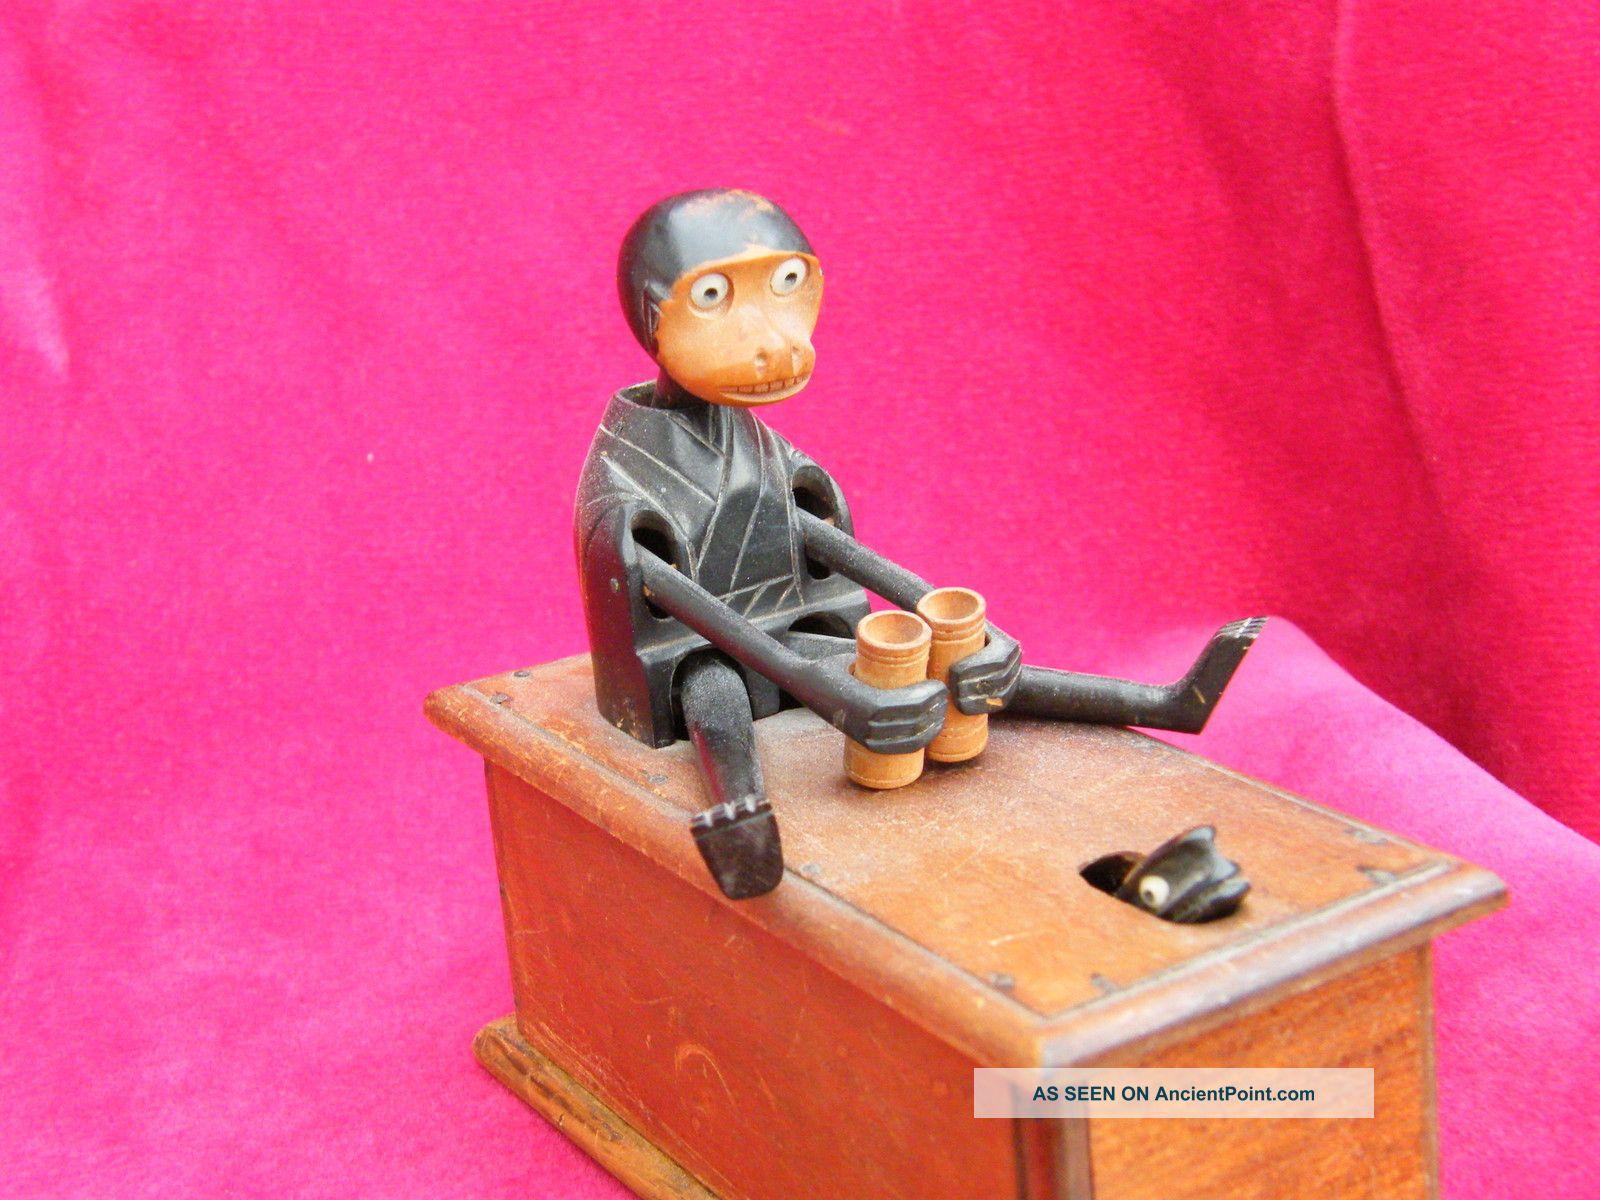 Japanese Wooden Kobe / Kobi Toy.  Monkey With Binoculars And Snake. Other photo